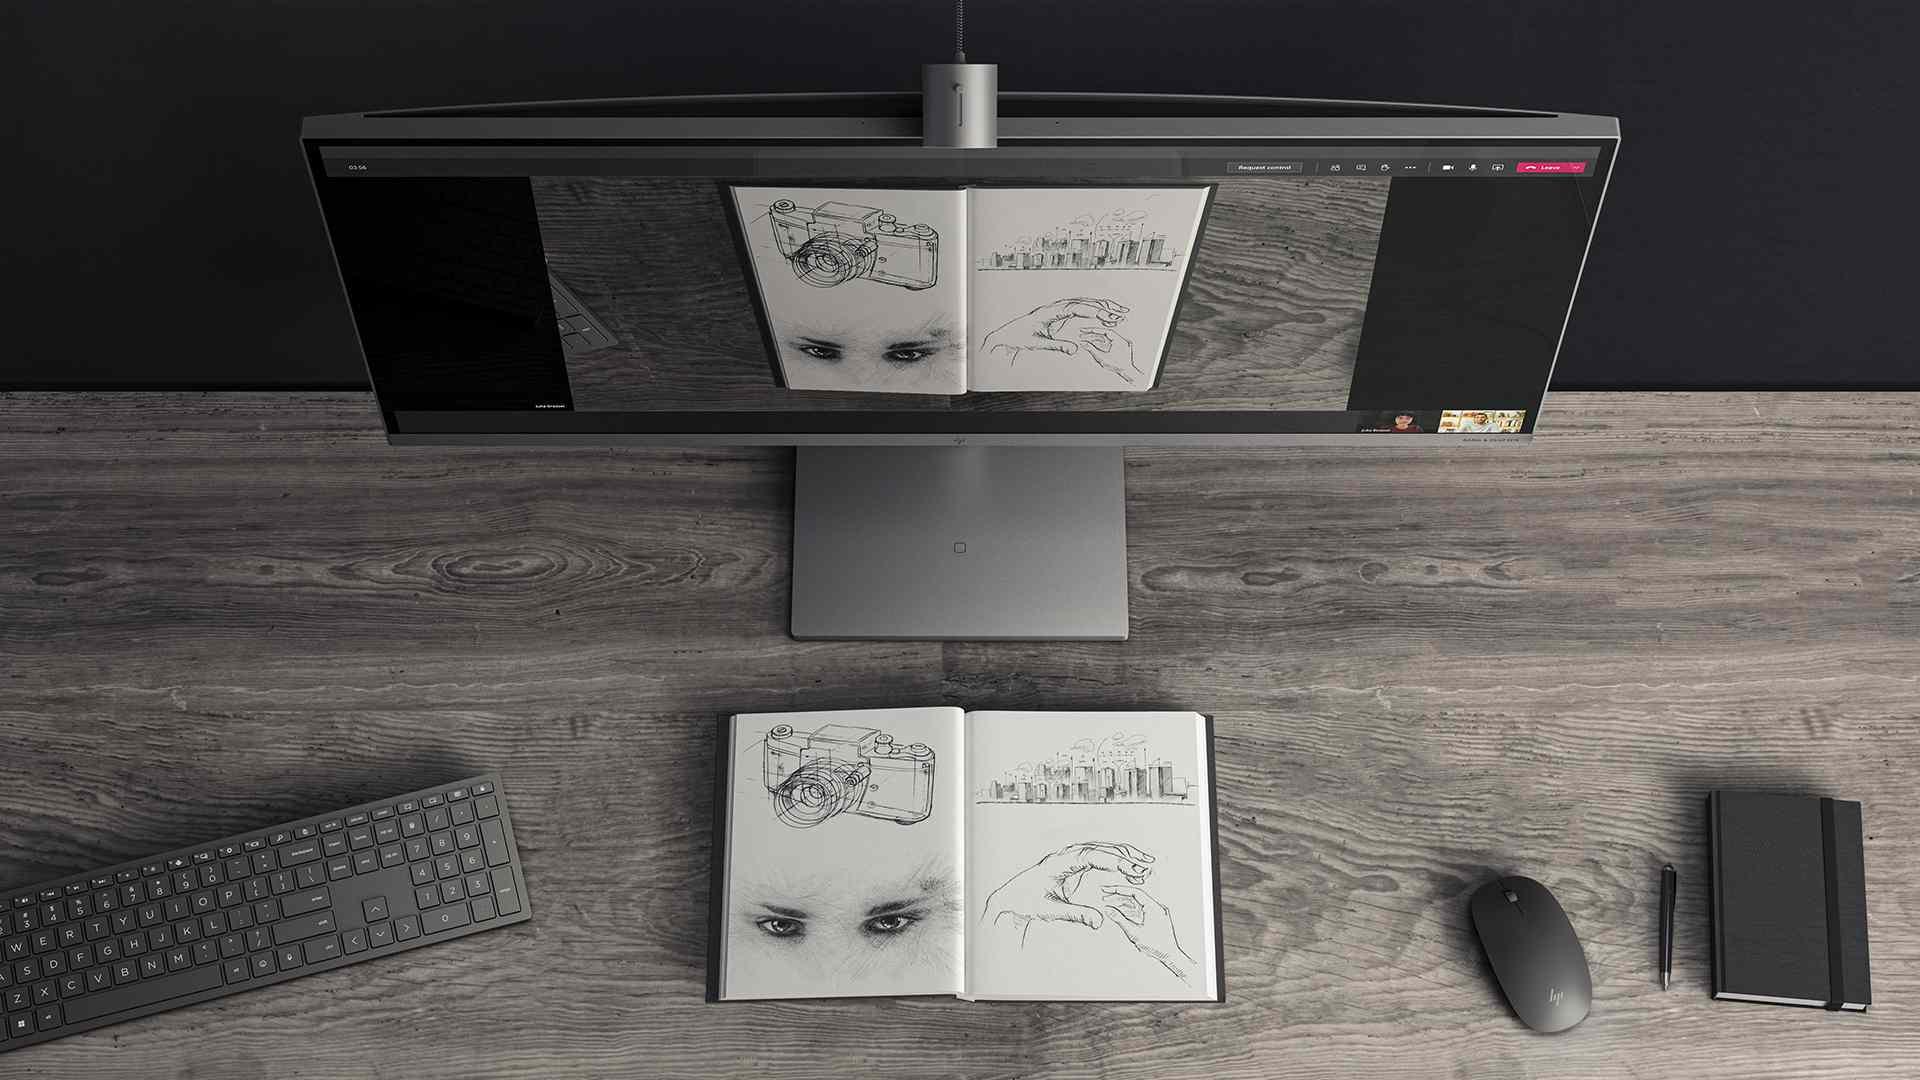 Sketchbook being shared using HP Envy 34-inch All-In-One desktop camera